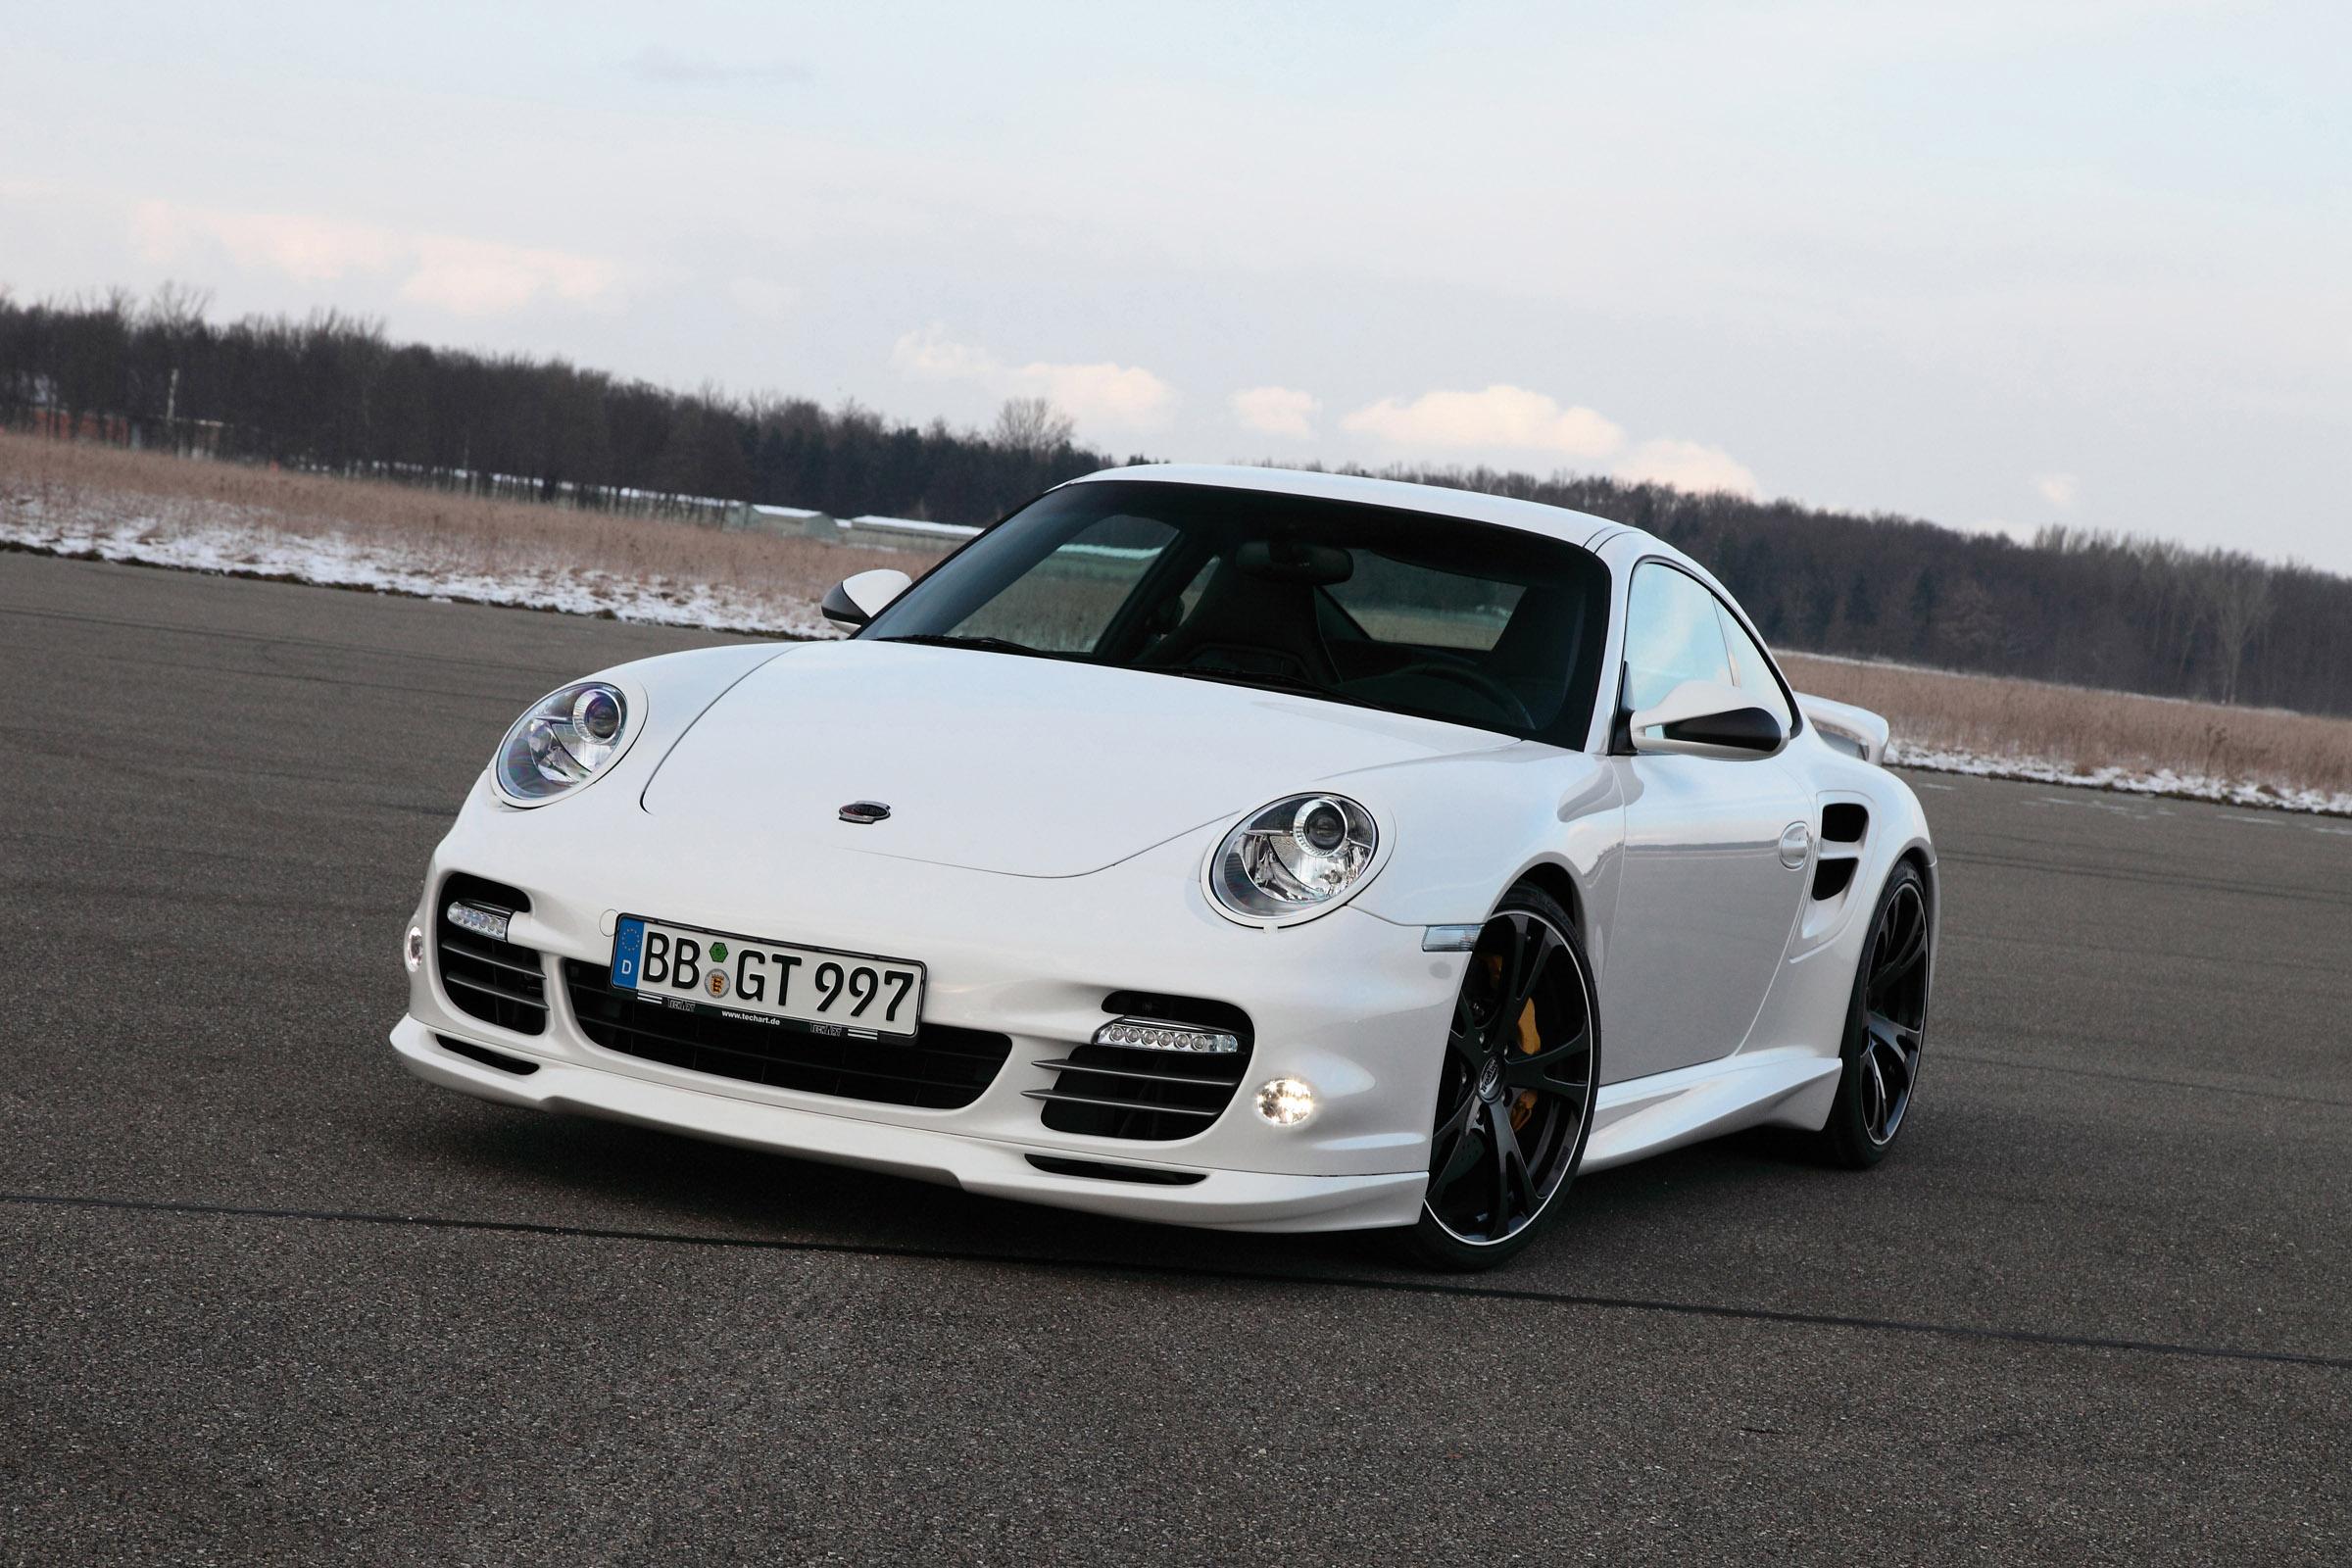 Techart S Porsche 911 Turbo S Fully Revealed Ahead Of